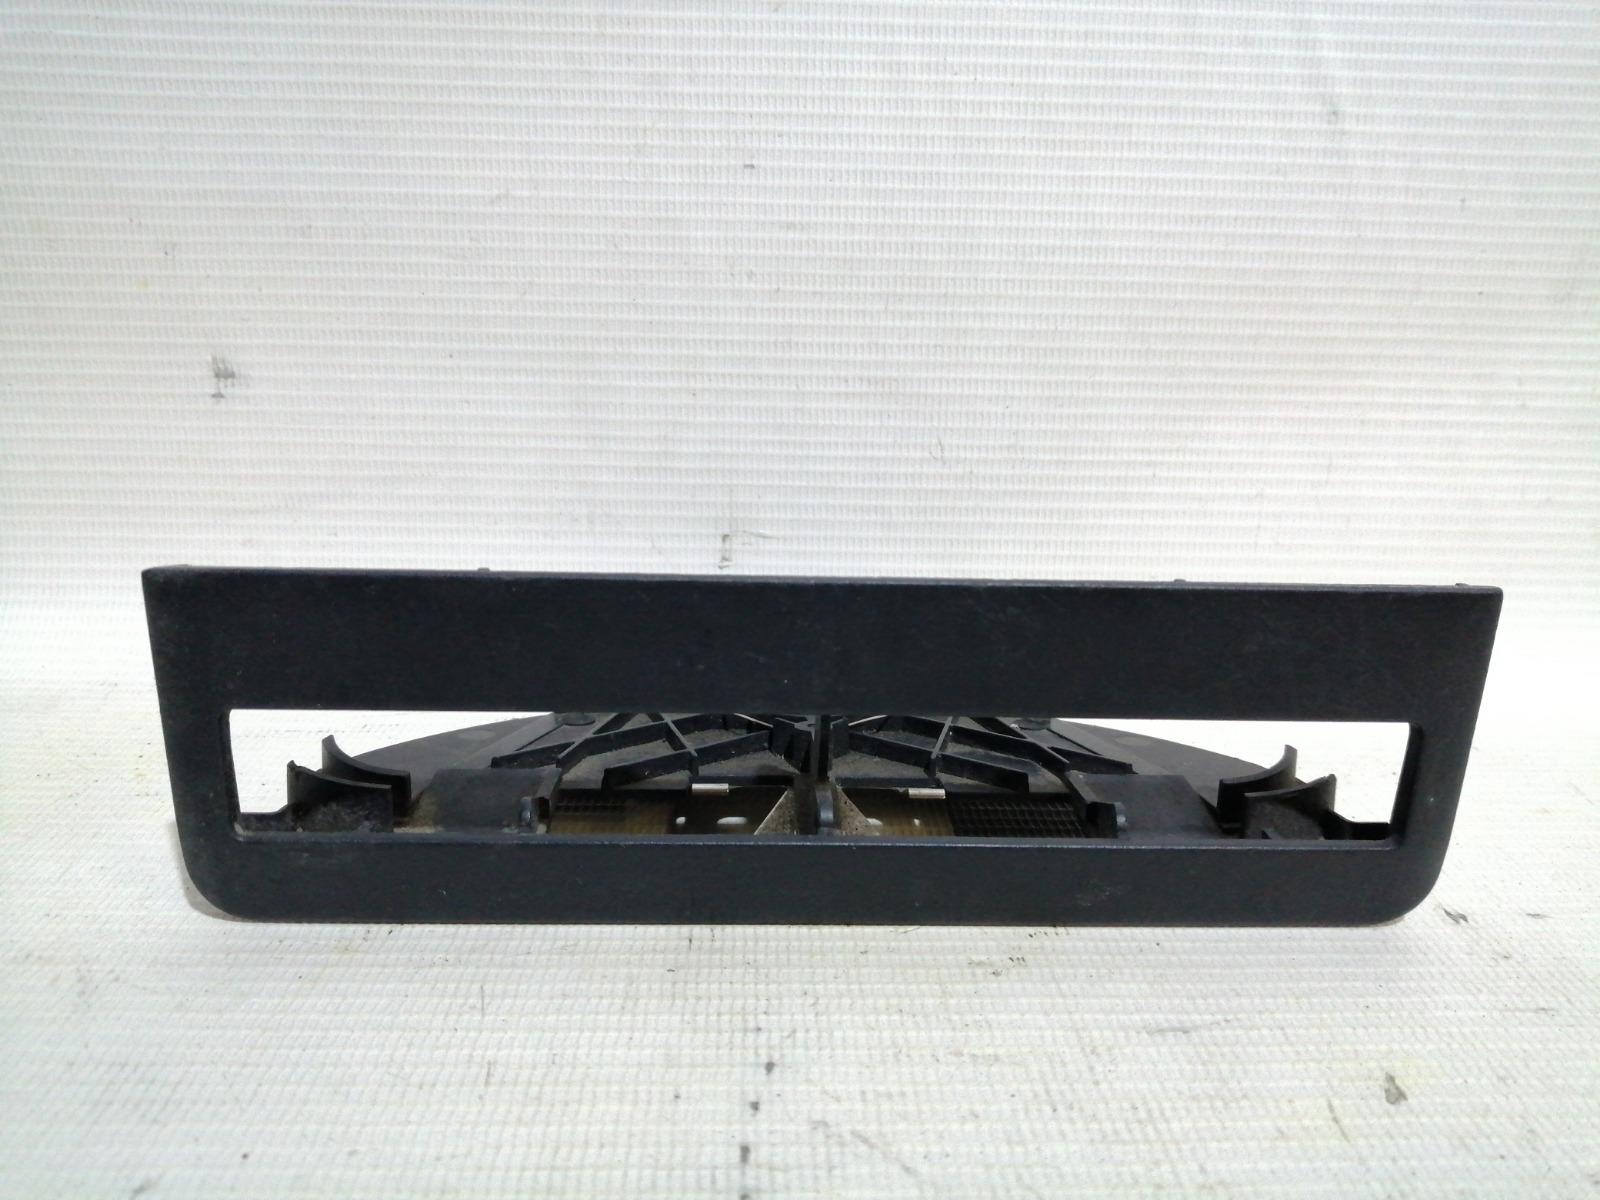 Рамка держателя емкостей Bmw 5-Series E39 M52B25 1995